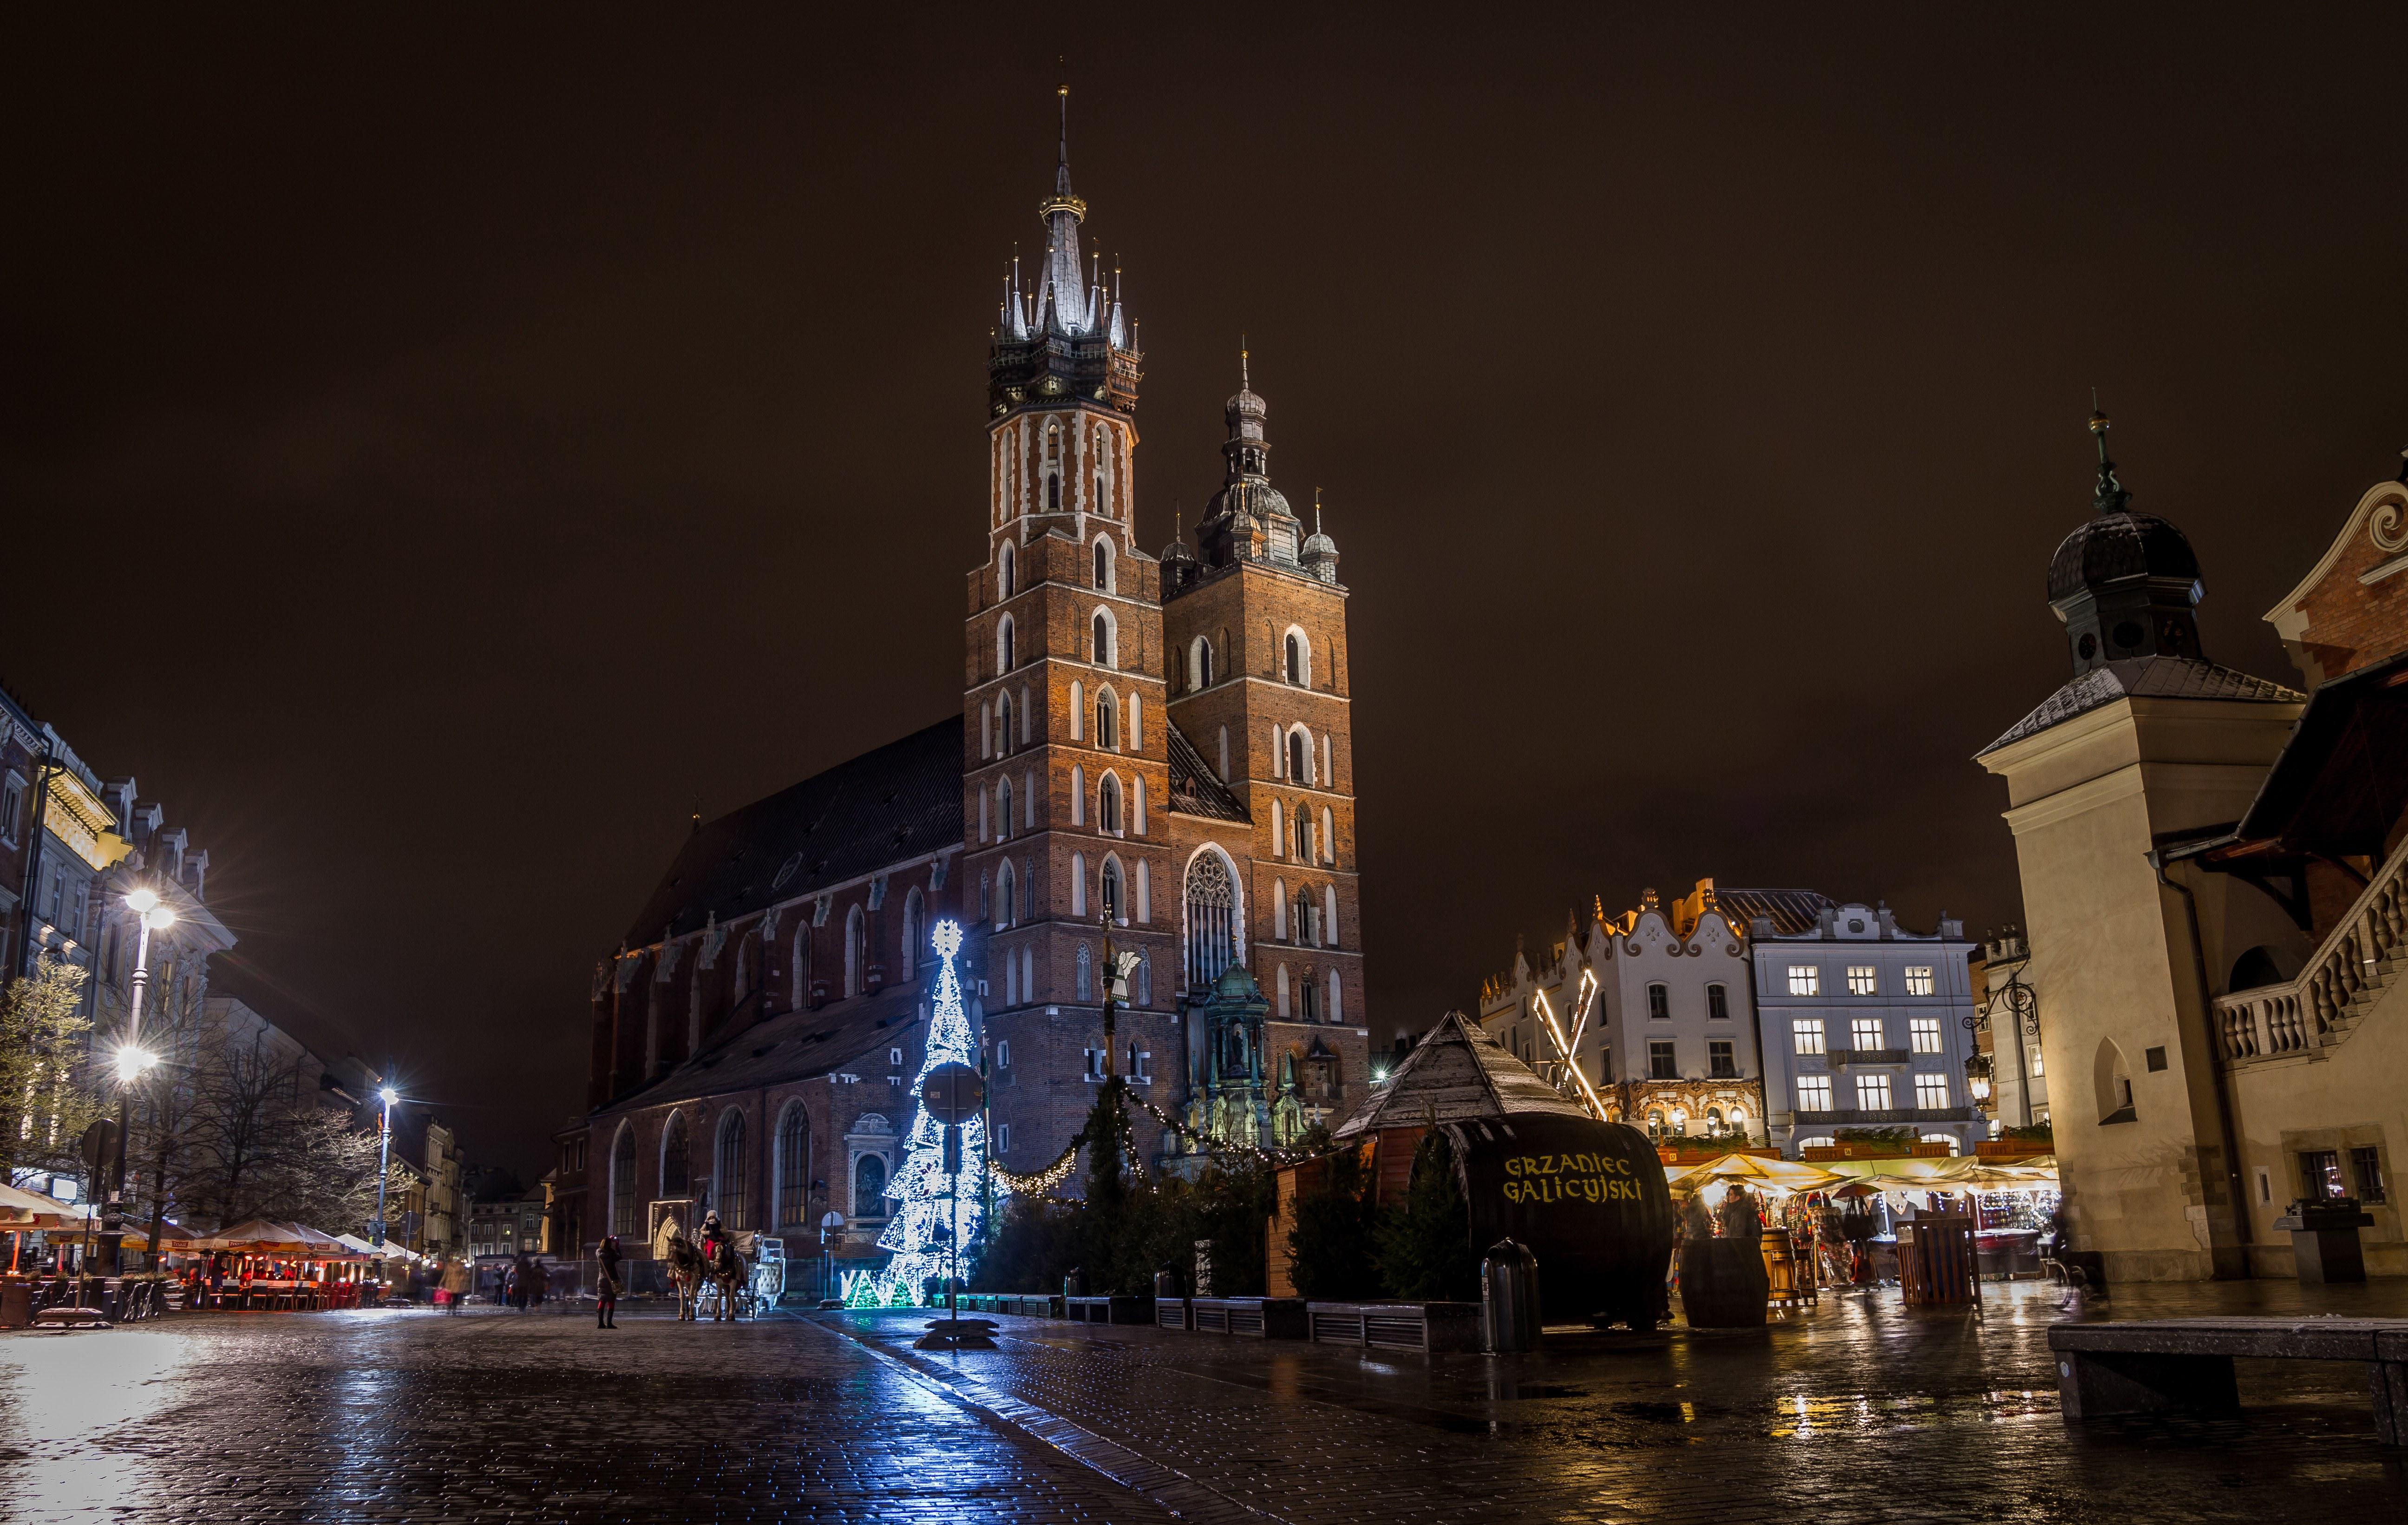 St mary's basilica (kościół mariacki) during christmas, krakow poland photo